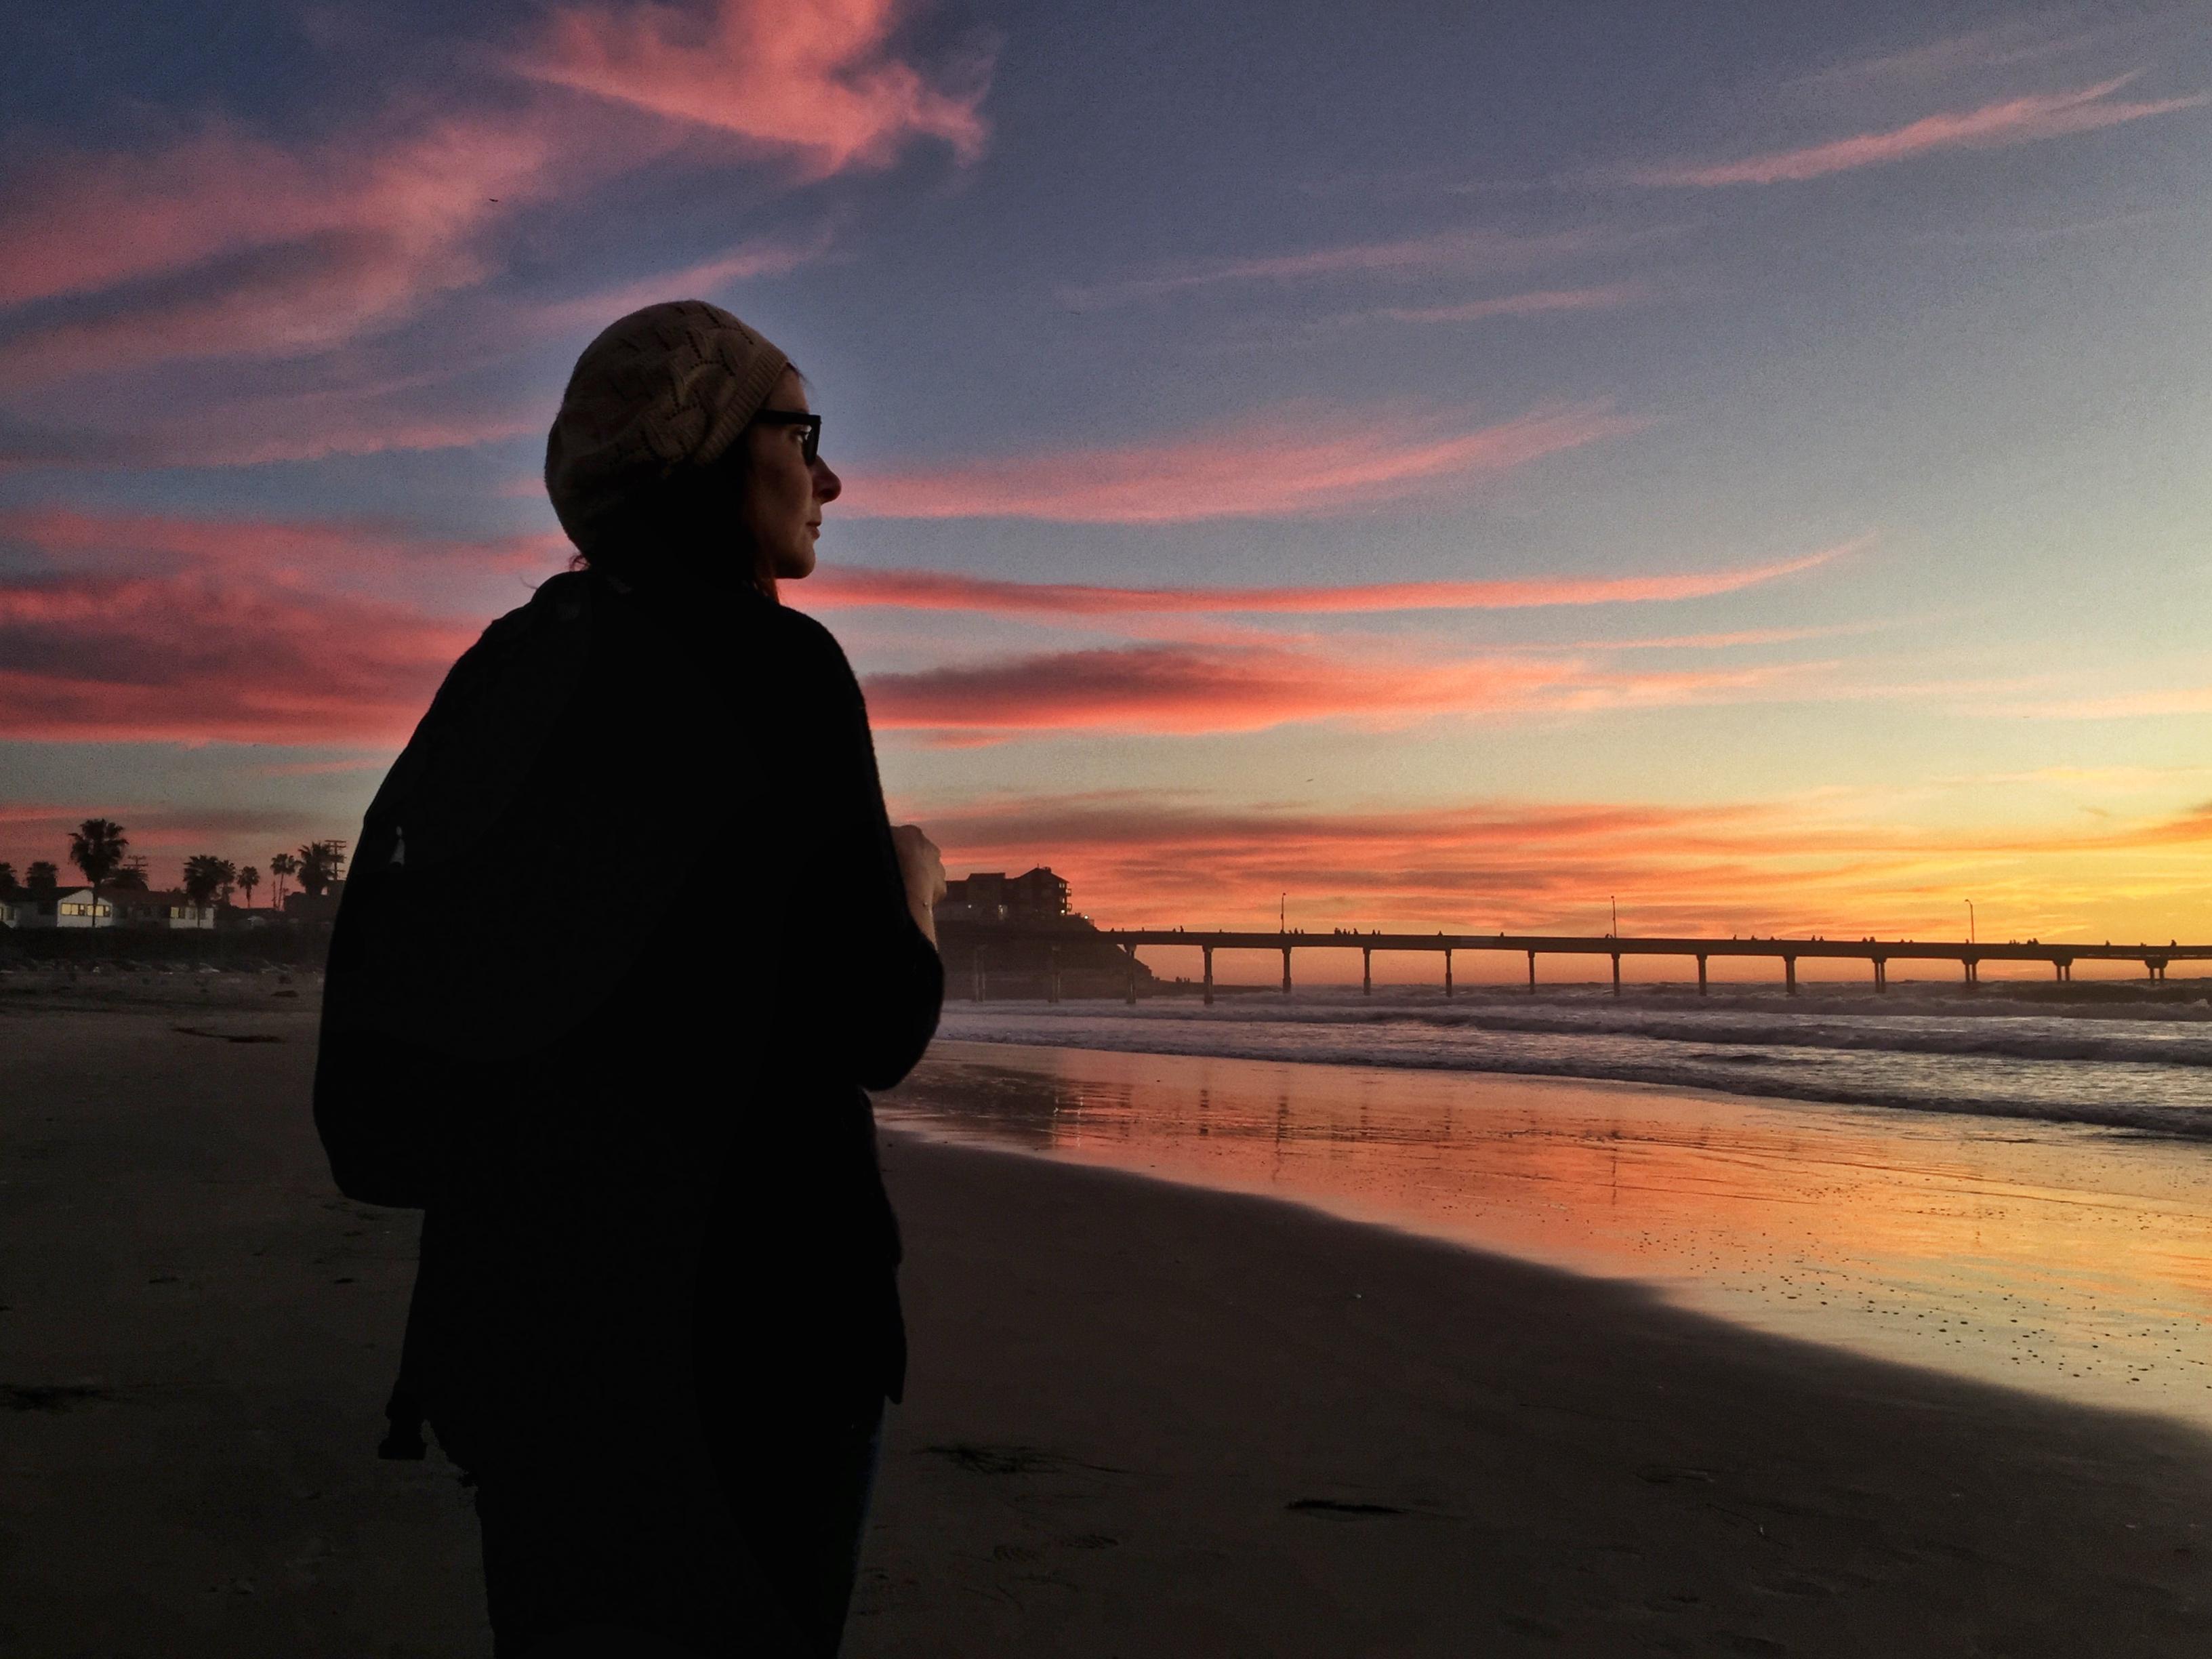 Sunset at the beach essay